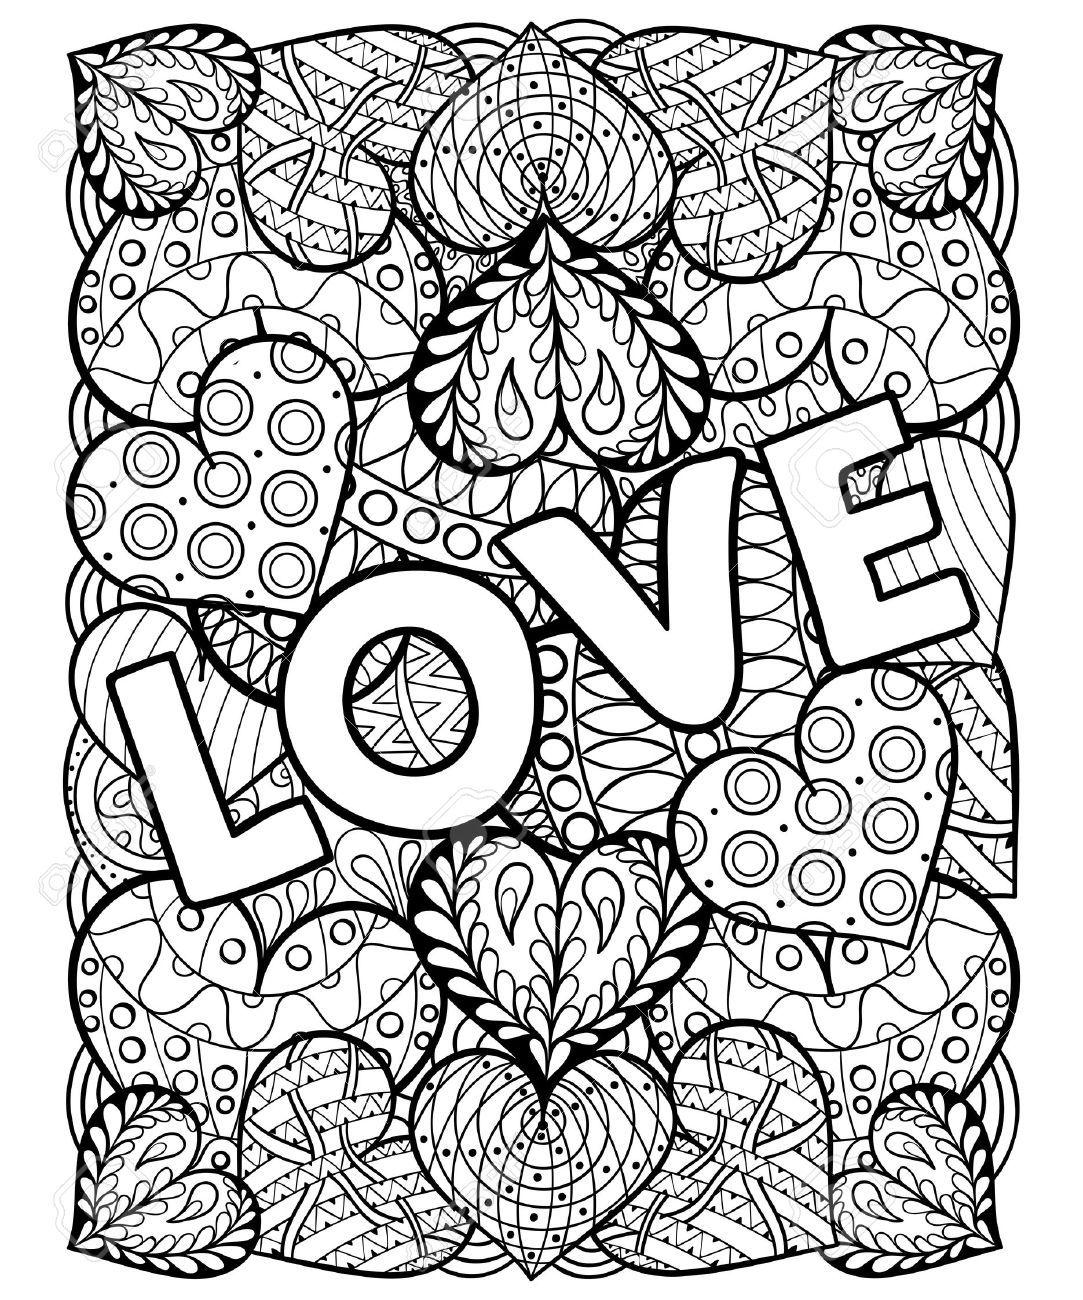 Resultado de imagen para zentangle art de amor | mandalas ...